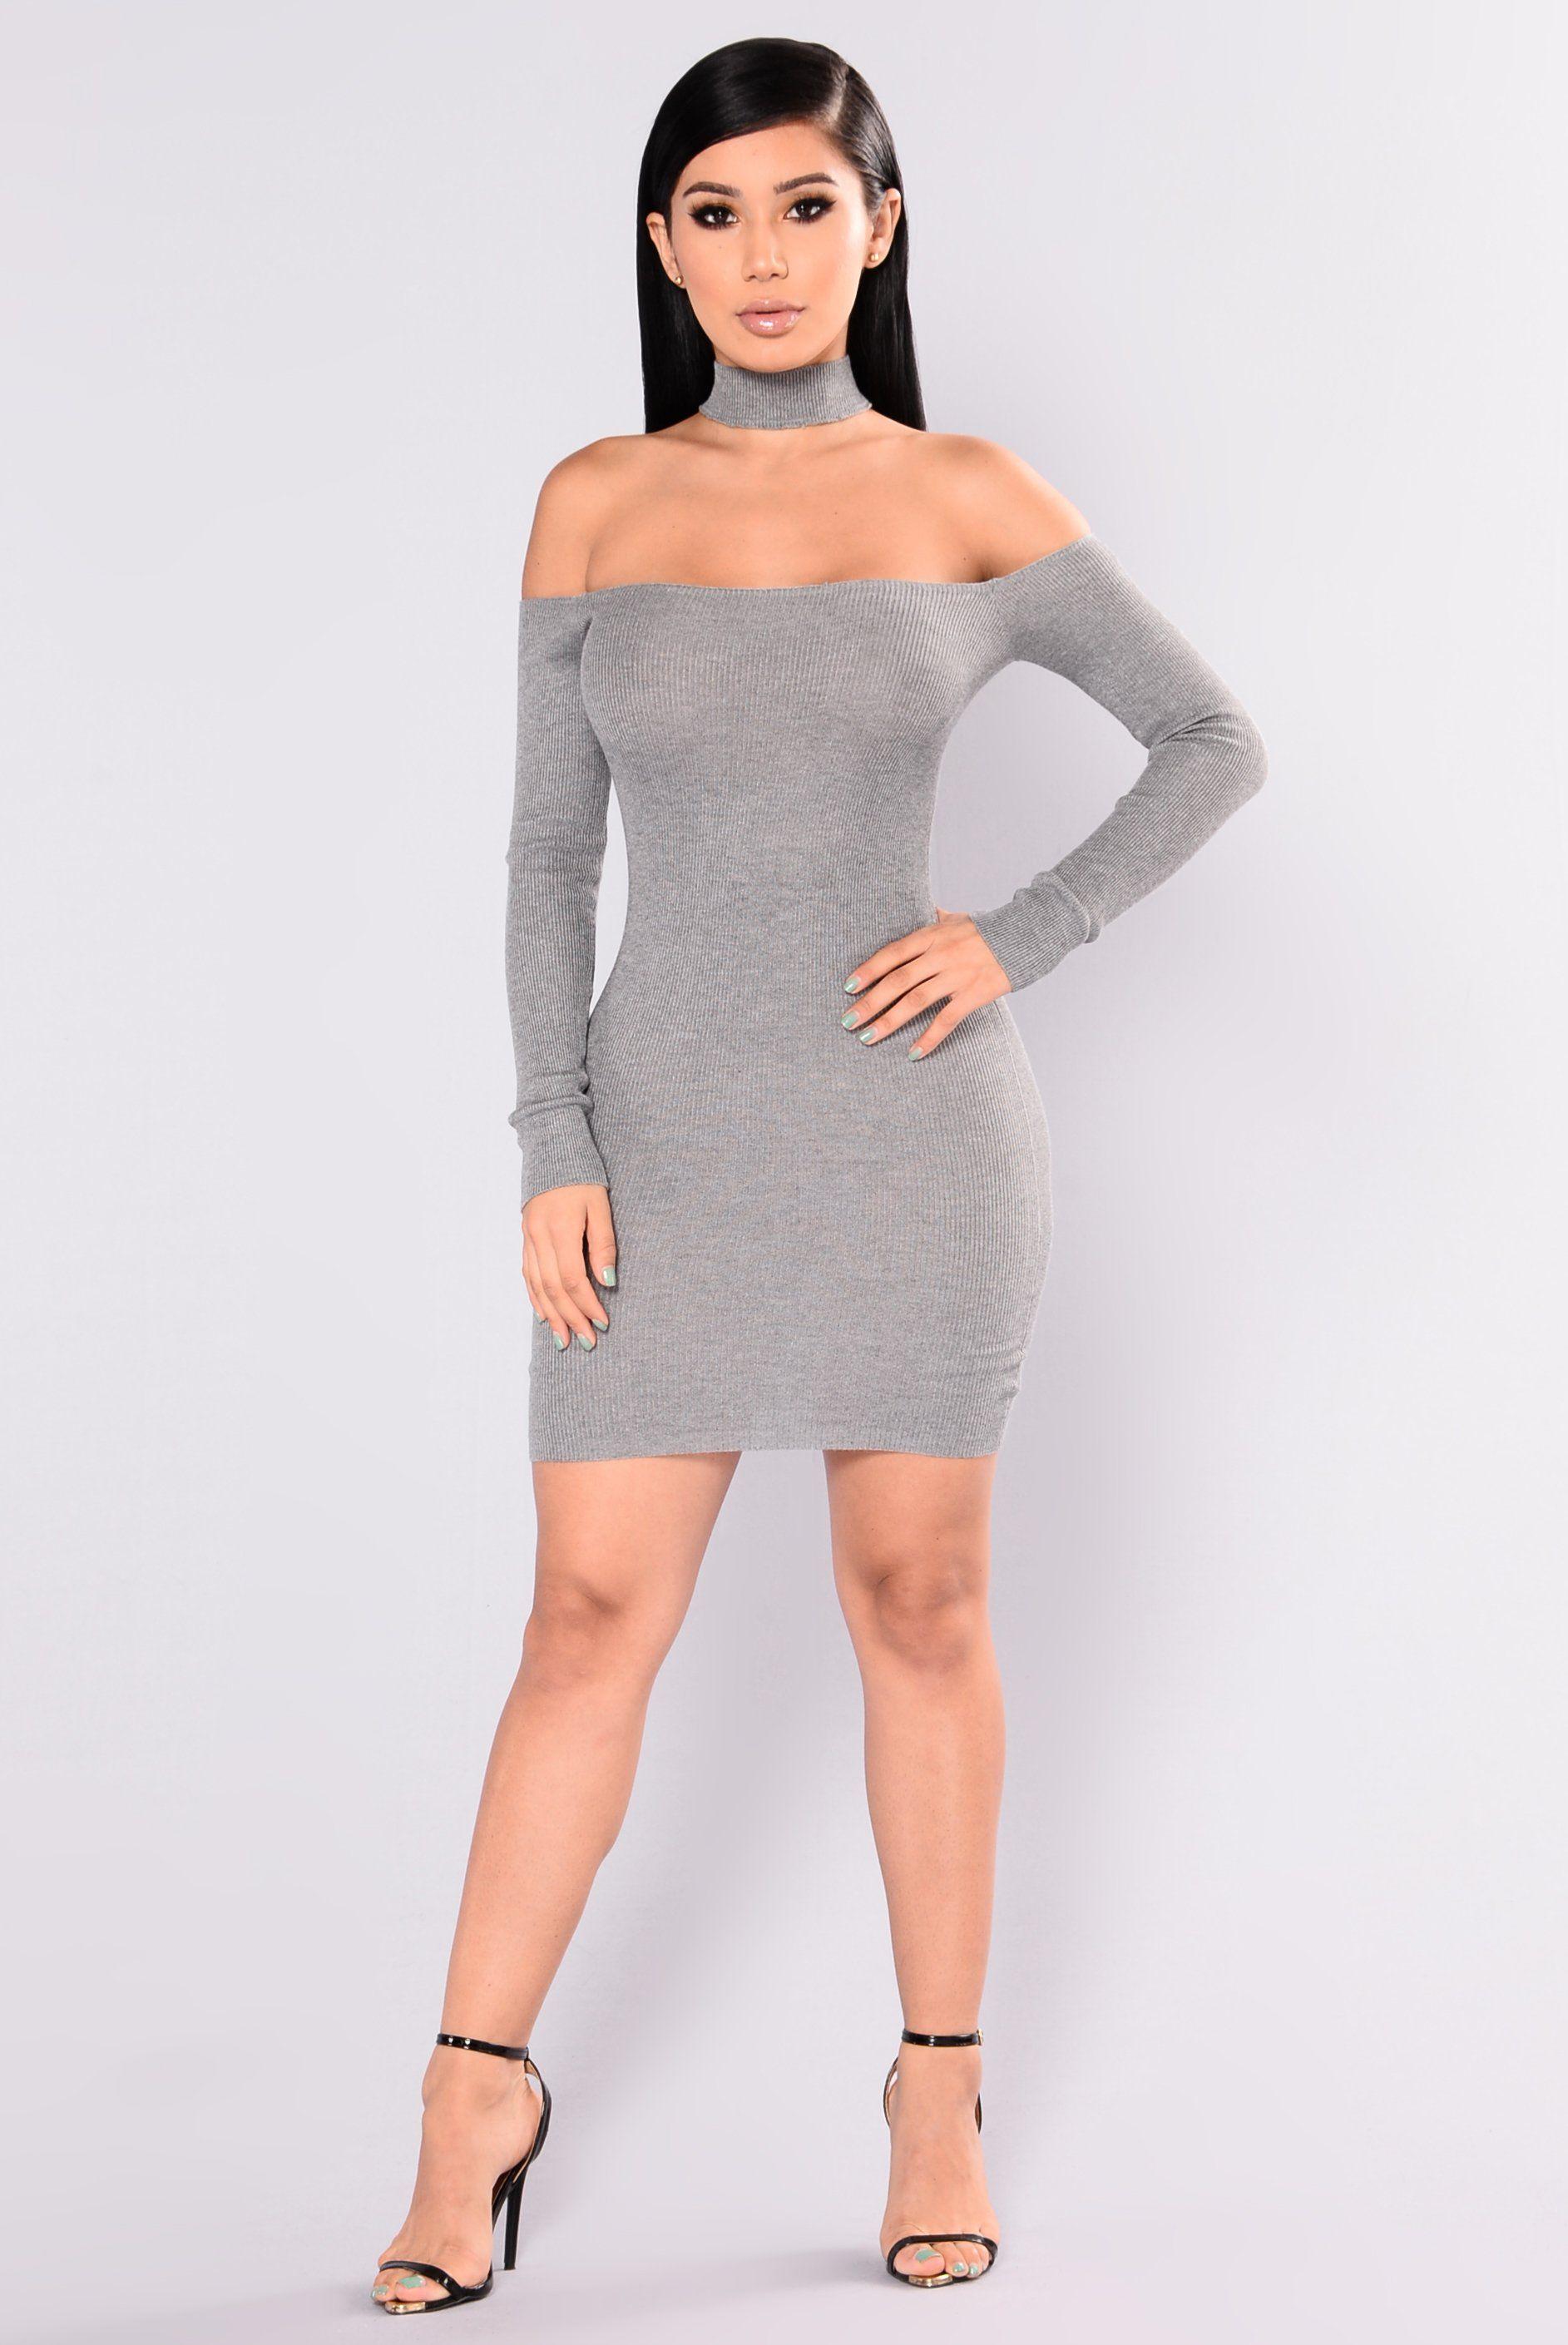 c6fa0932c9f8 Liv Sweater Dress - Heather Grey. Liv Sweater Dress - Heather Grey Women's Fashion  Dresses ...